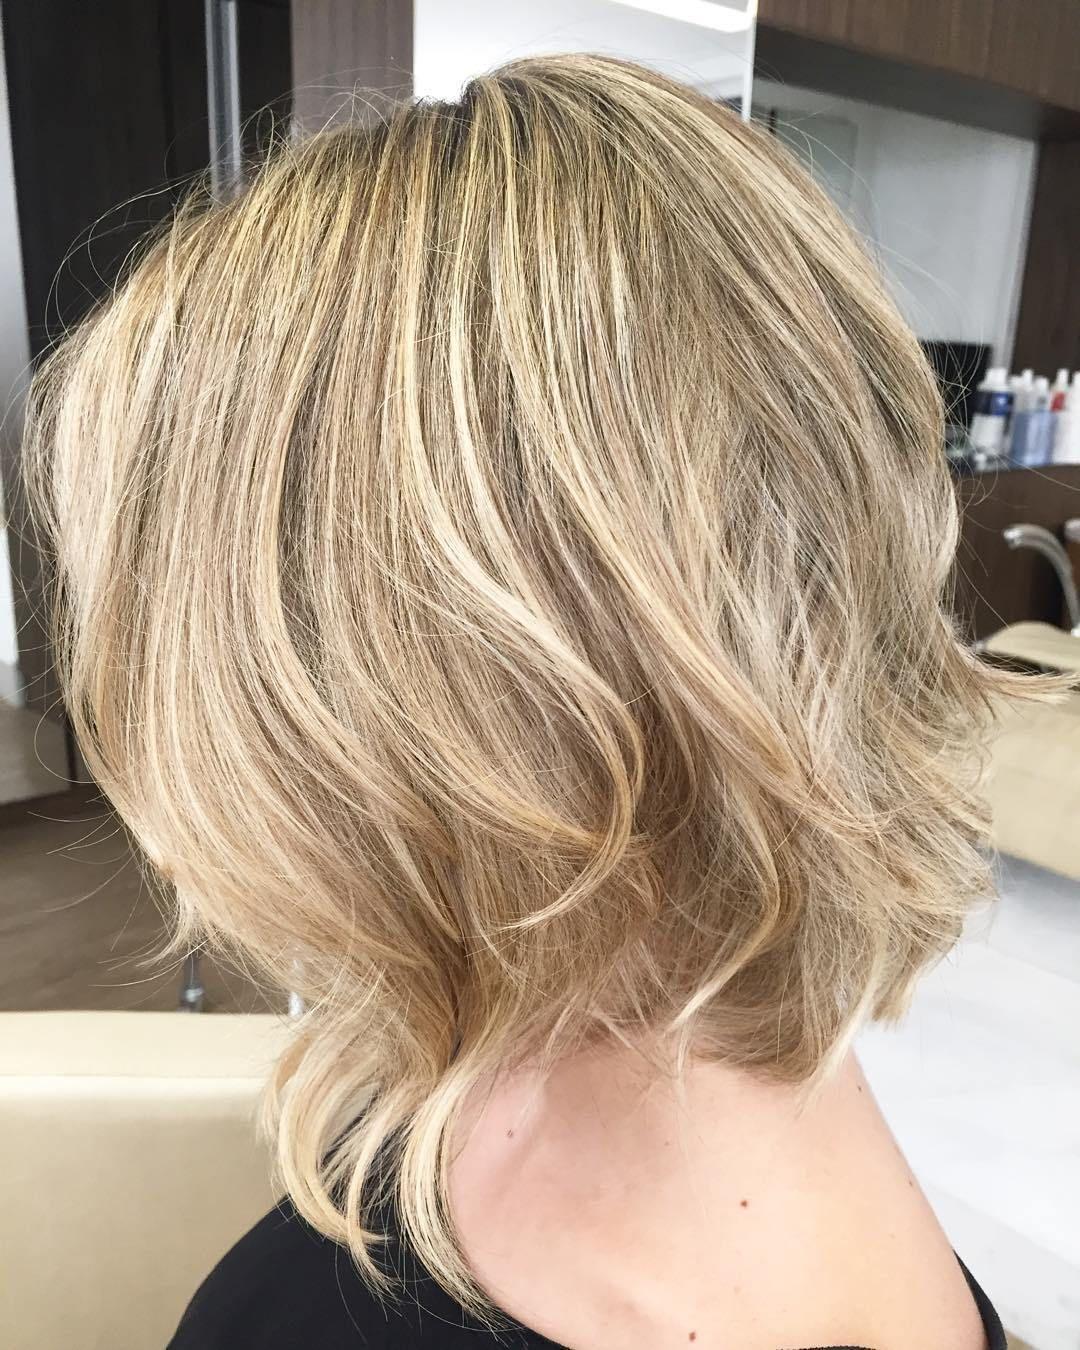 Medium Bob With Longer Front Strands Haircuts For Fine Hair Bob Hairstyles For Fine Hair Fine Hair